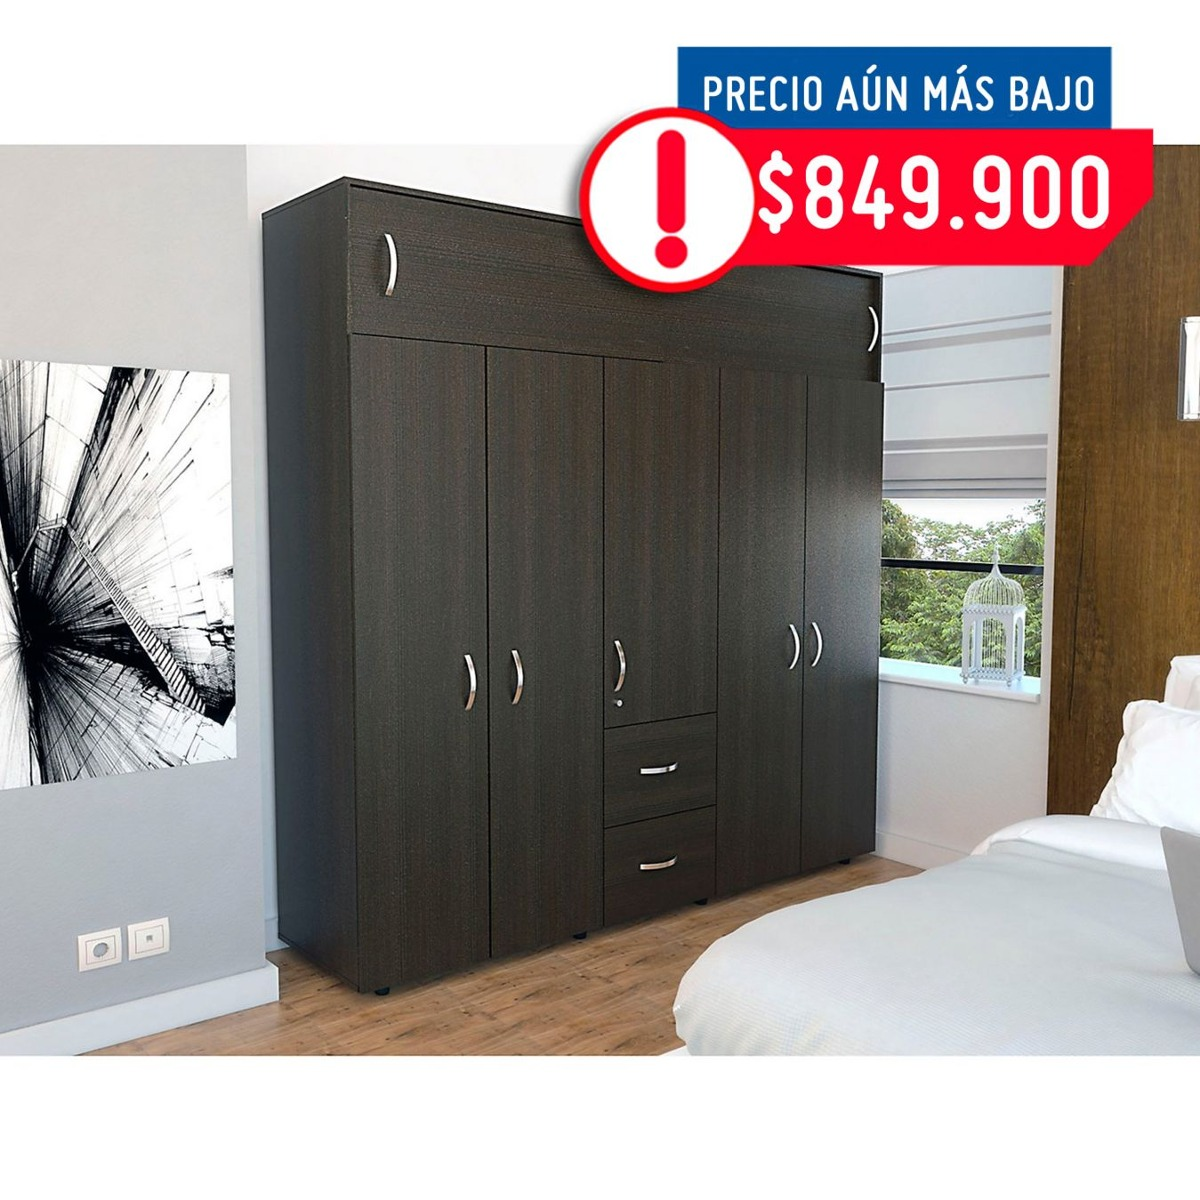 Rta Design Closet Bigaf 204x200.1x50.3cm Muebles Mueble Acu2 ...